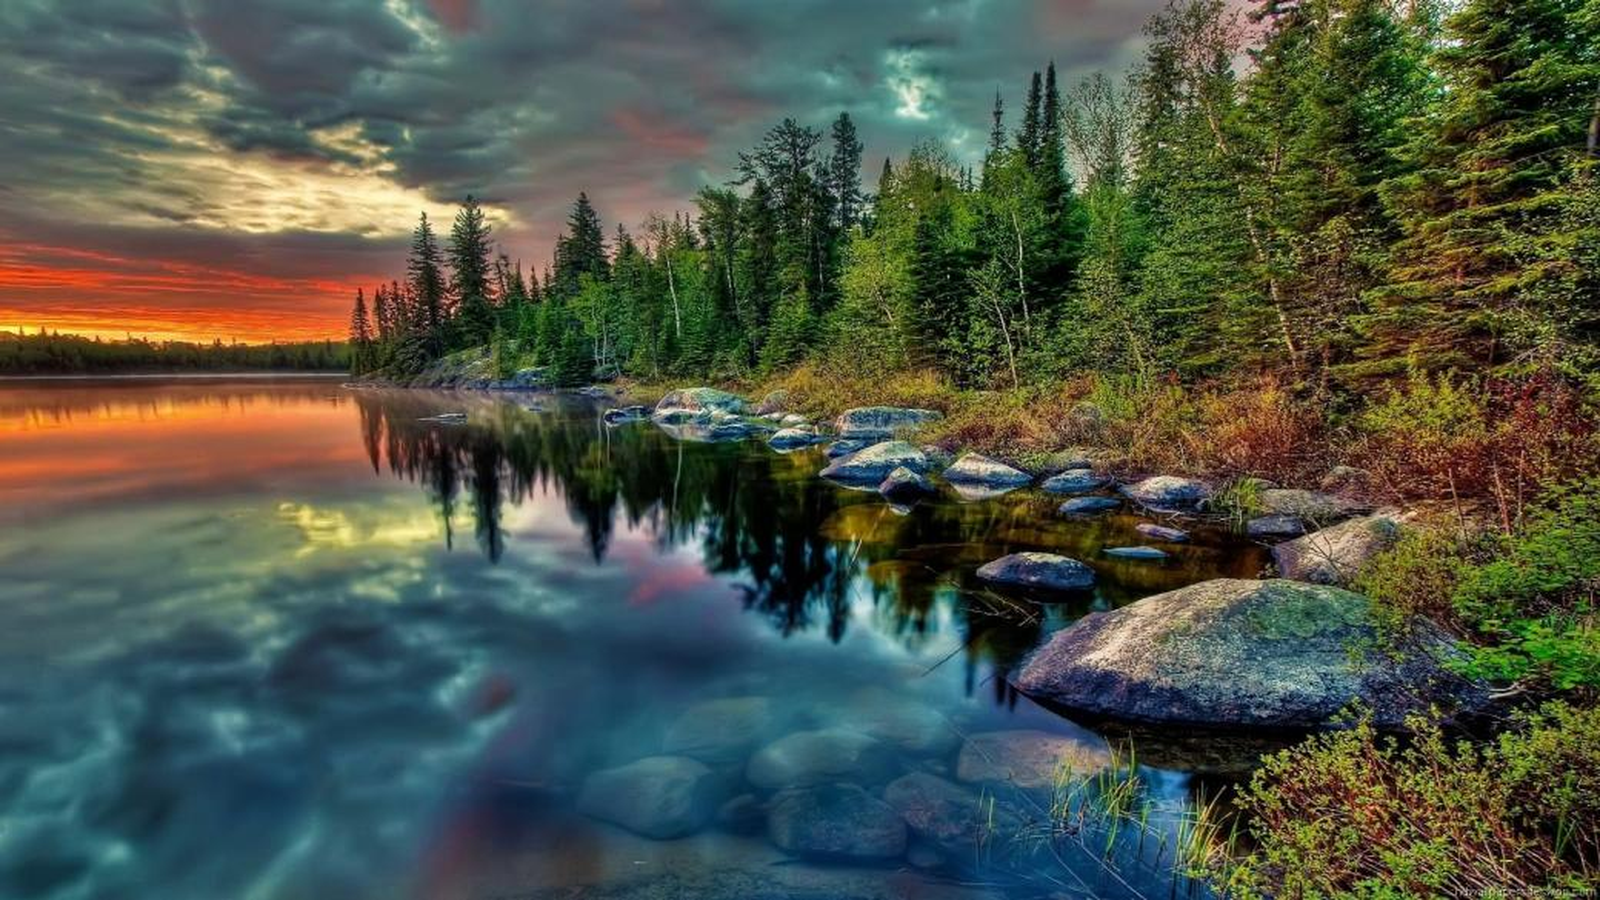 Błękitne Jezioro - JEzioro blekitne blekitne blekitne